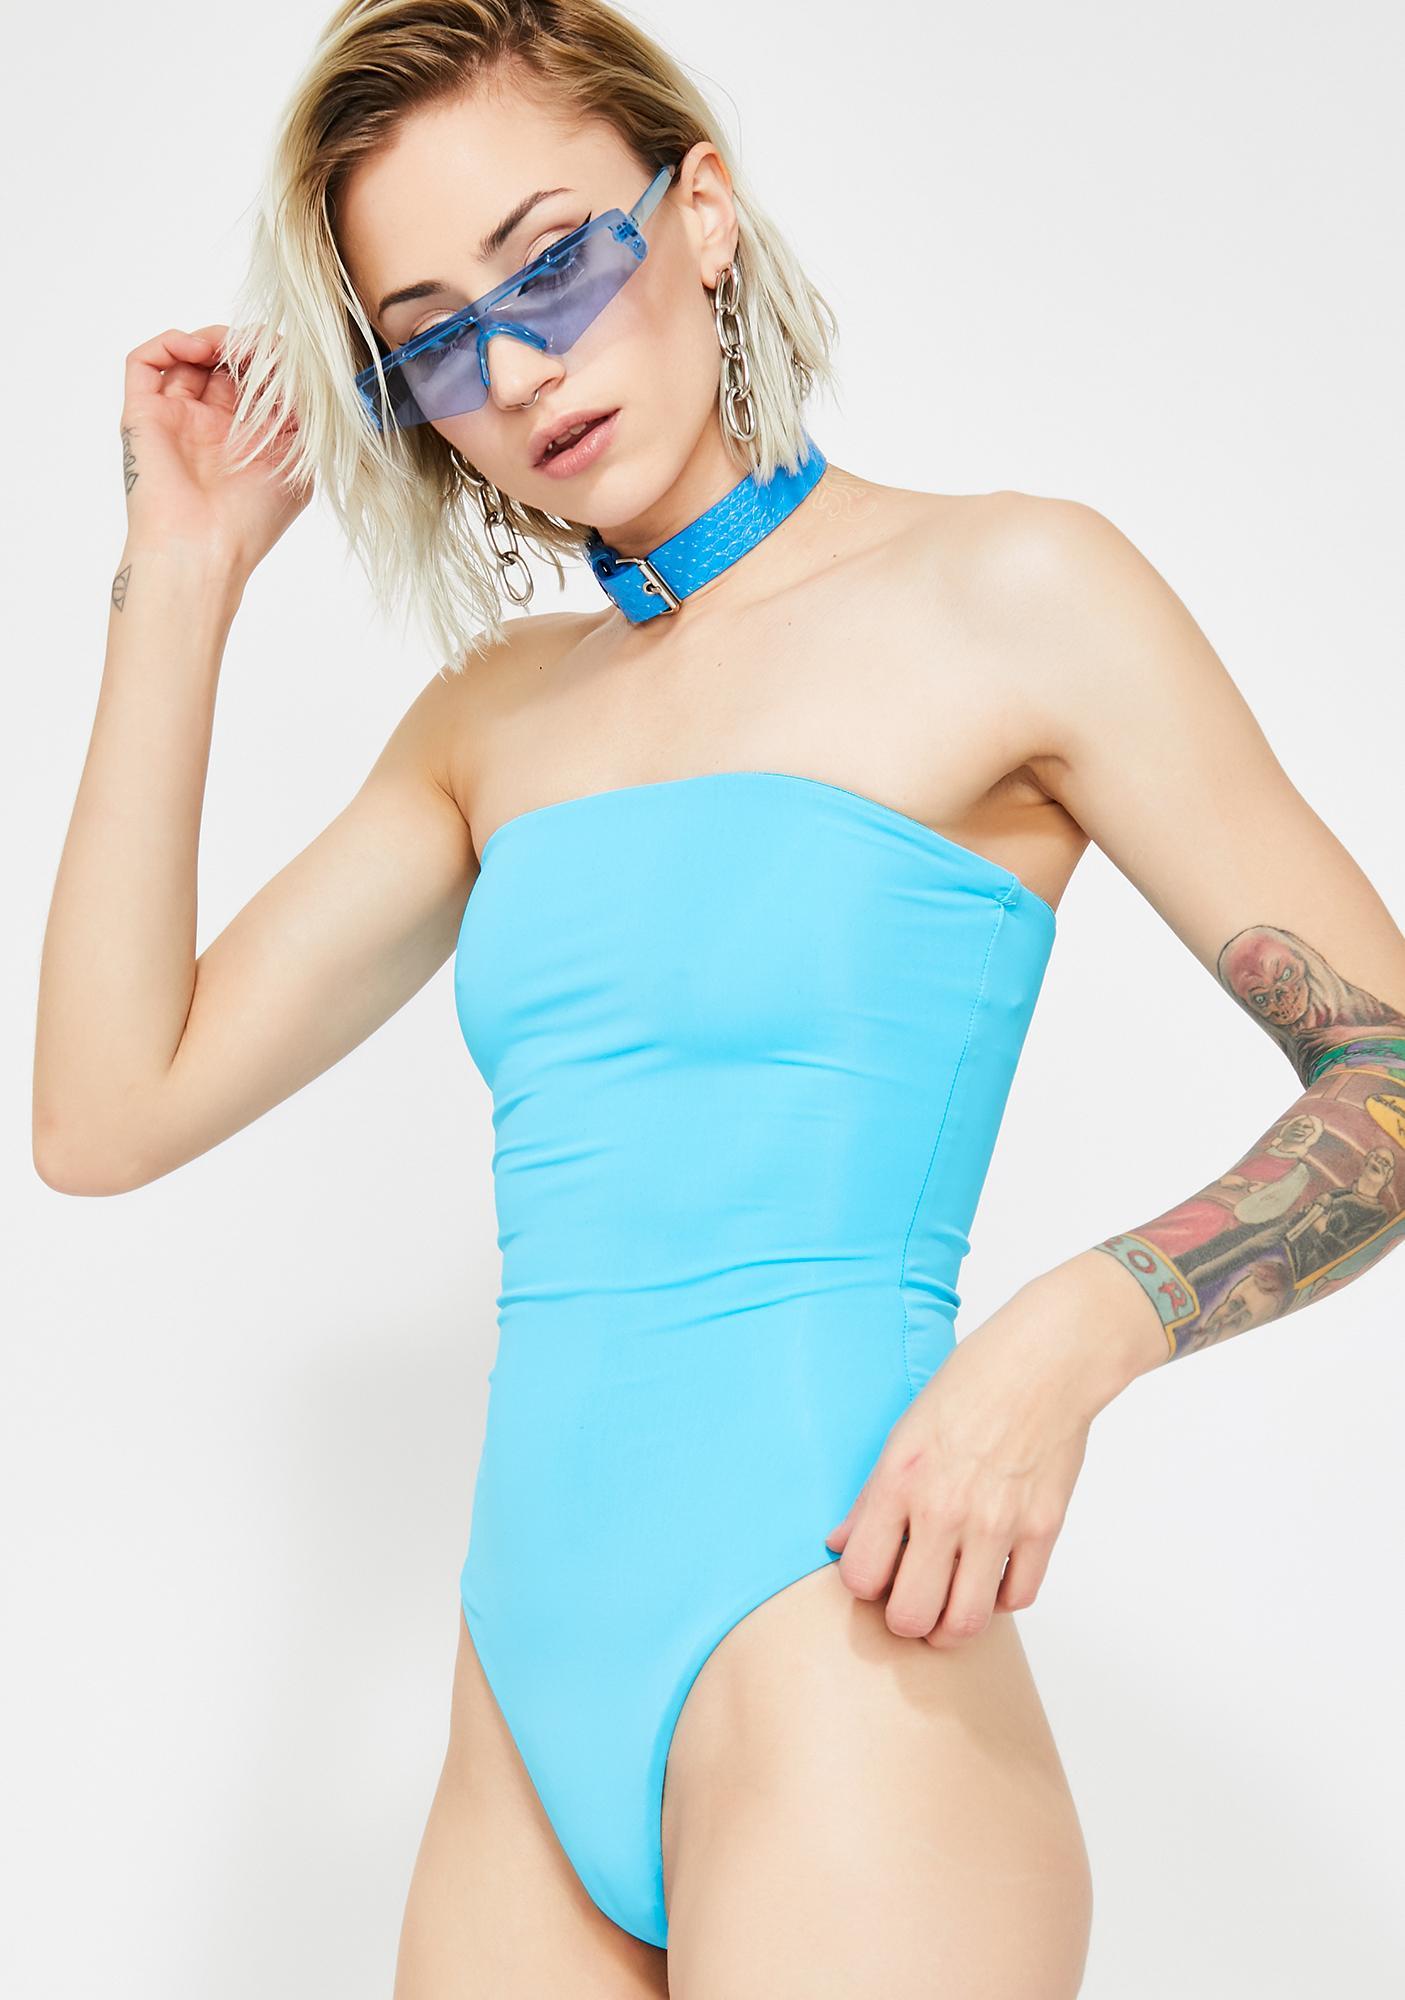 Merbae Sugar Highz Strapless Bodysuit